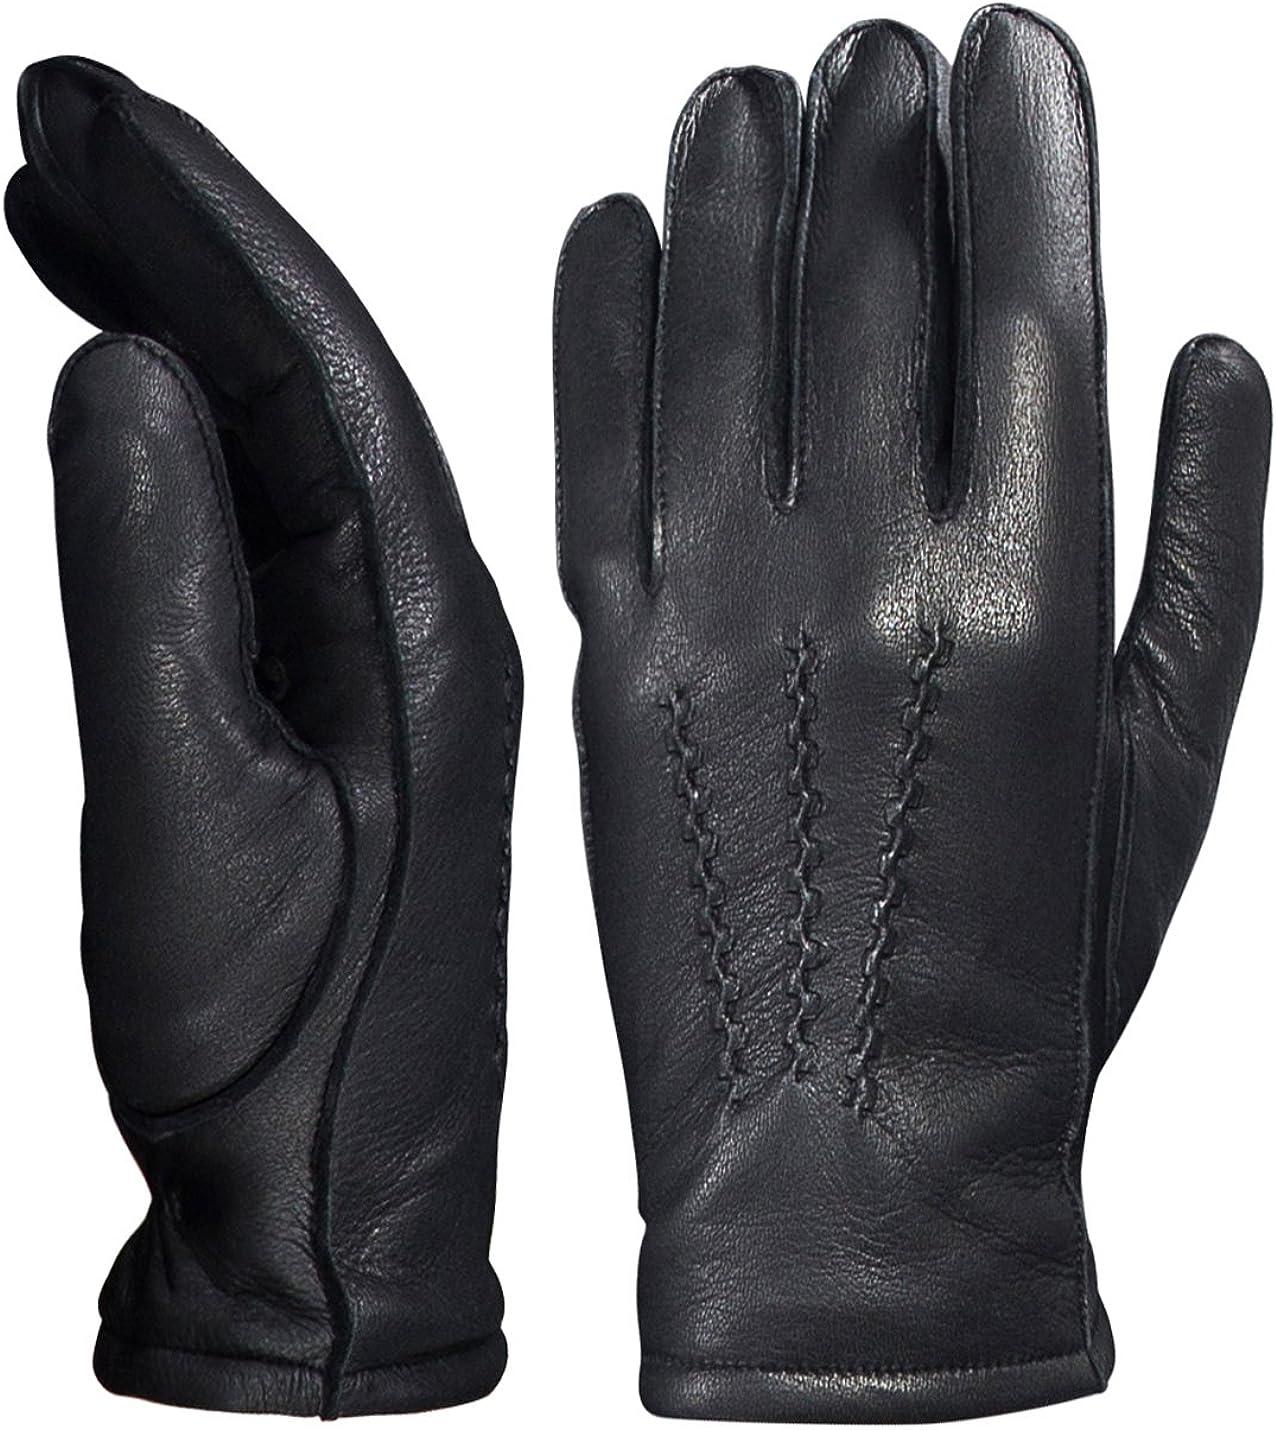 YISEVEN Men's Deerskin Leather Dress Se Fleece Be super welcome Lined Max 82% OFF Gloves Hand